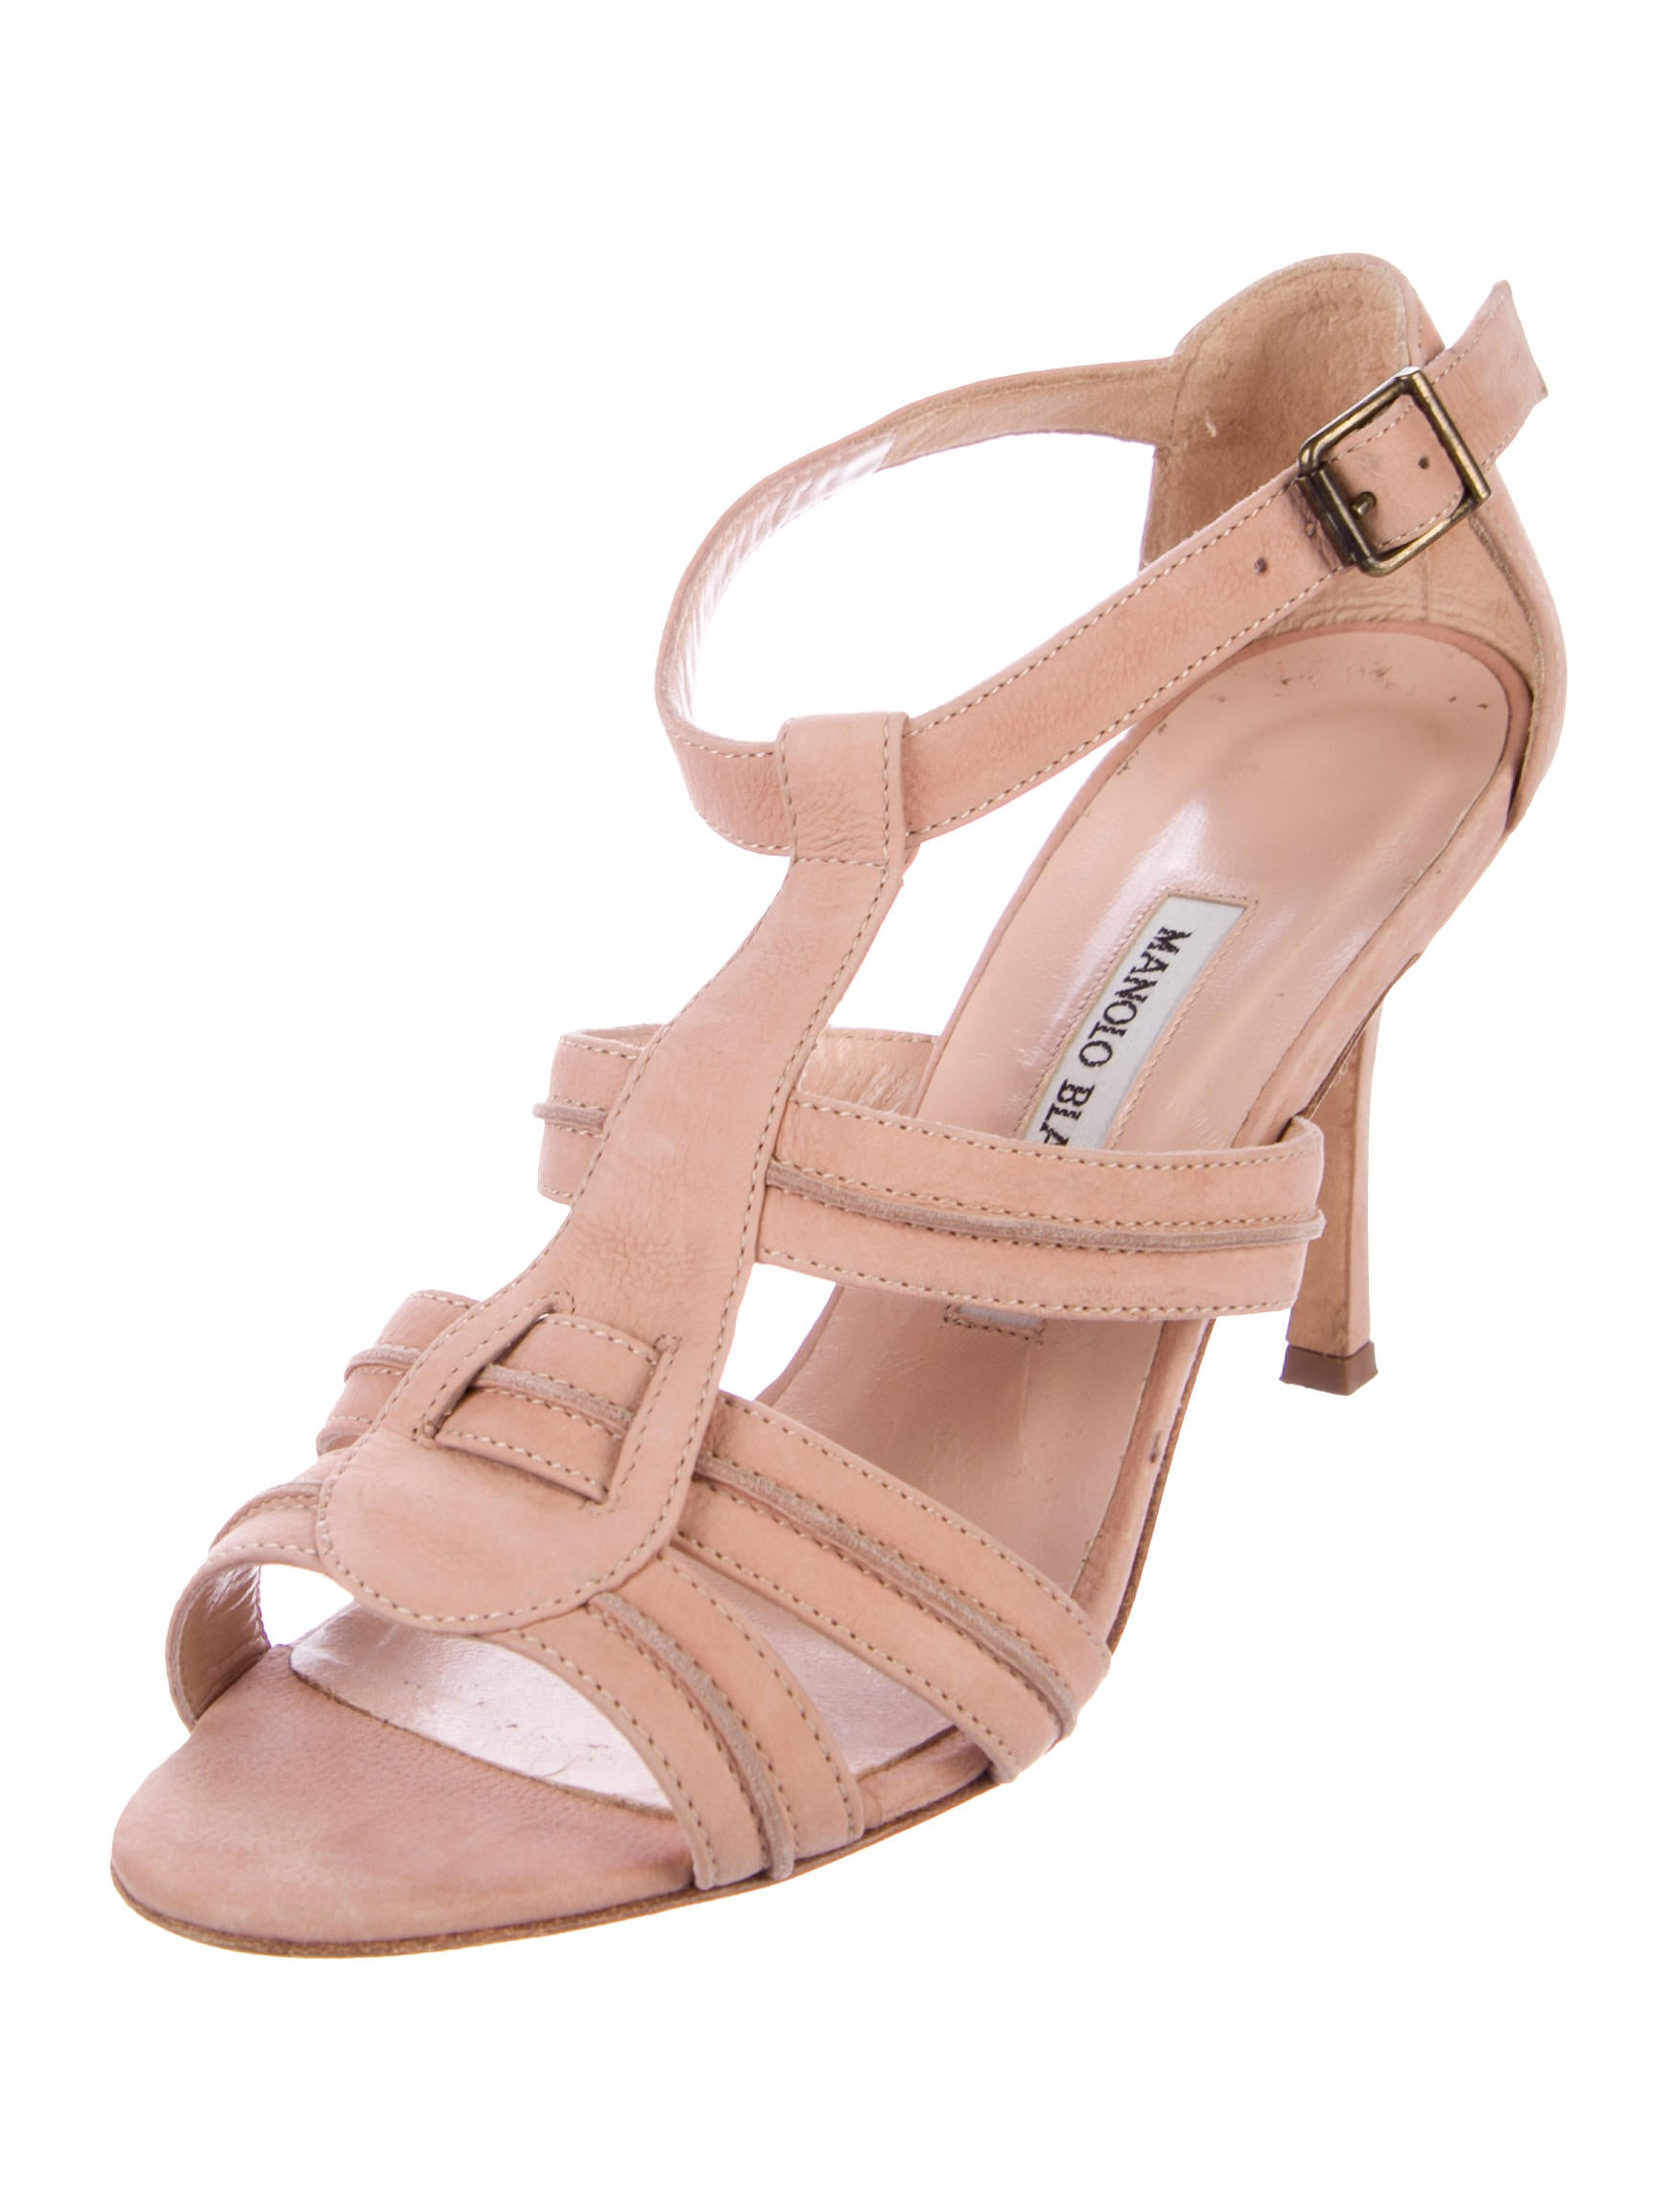 3b37b7d554b Manolo Blahnik Suede T-Strap Sandals - Shoes - MOO76472 .